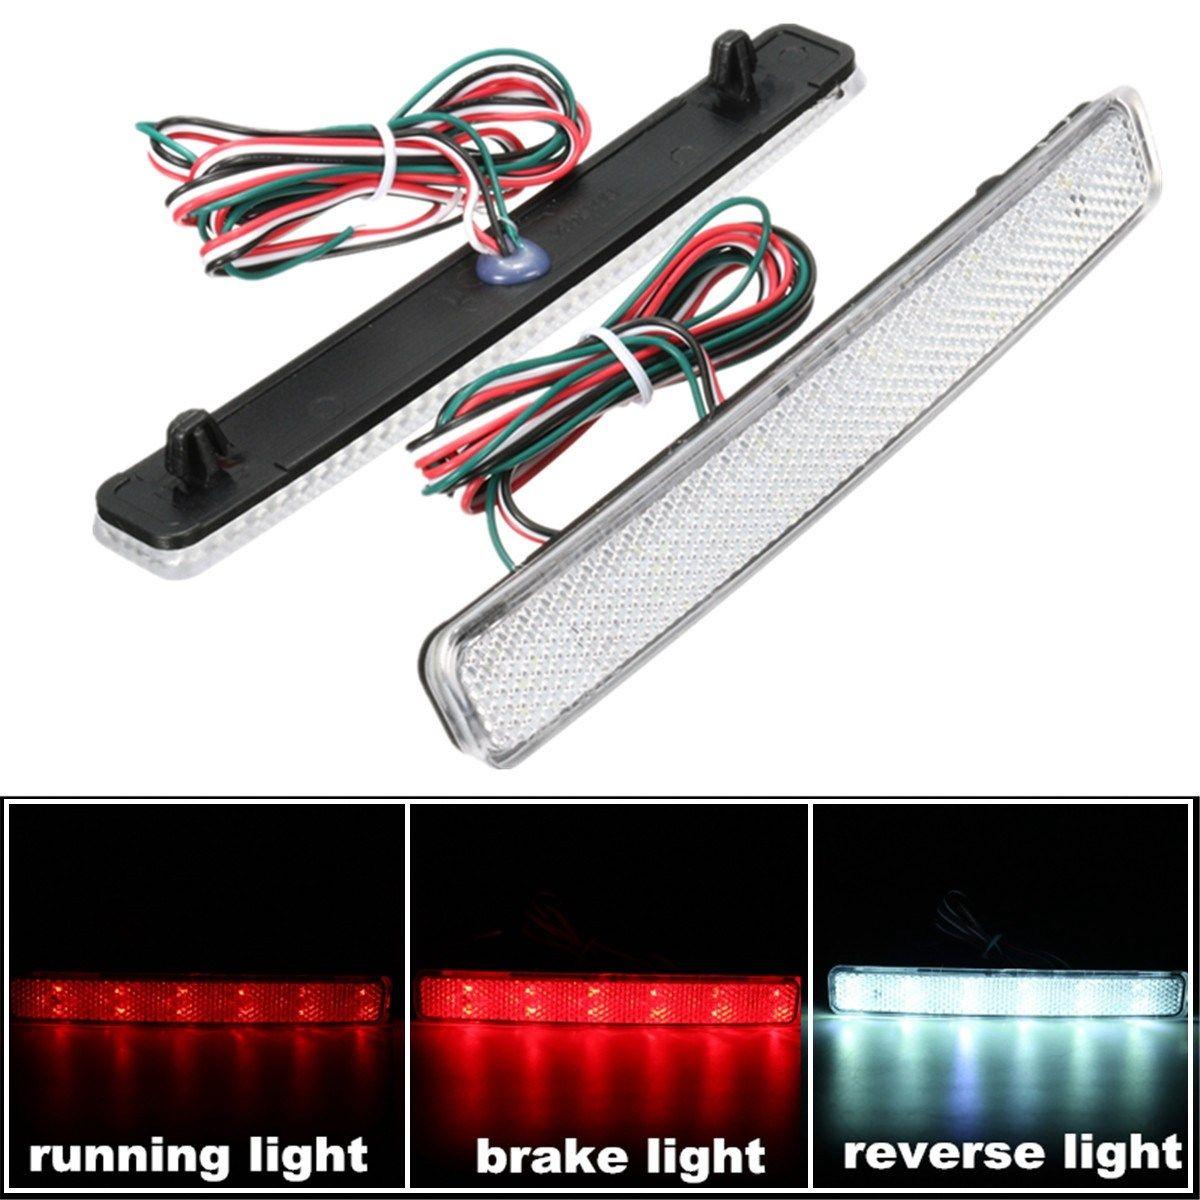 Freeshipping 2x 24 LED Auto Rear Reflectors Bumper Tail Fog Lamp Brake Stop  Night Running Lights Driving Reverse Light For VW/T5 Transporter